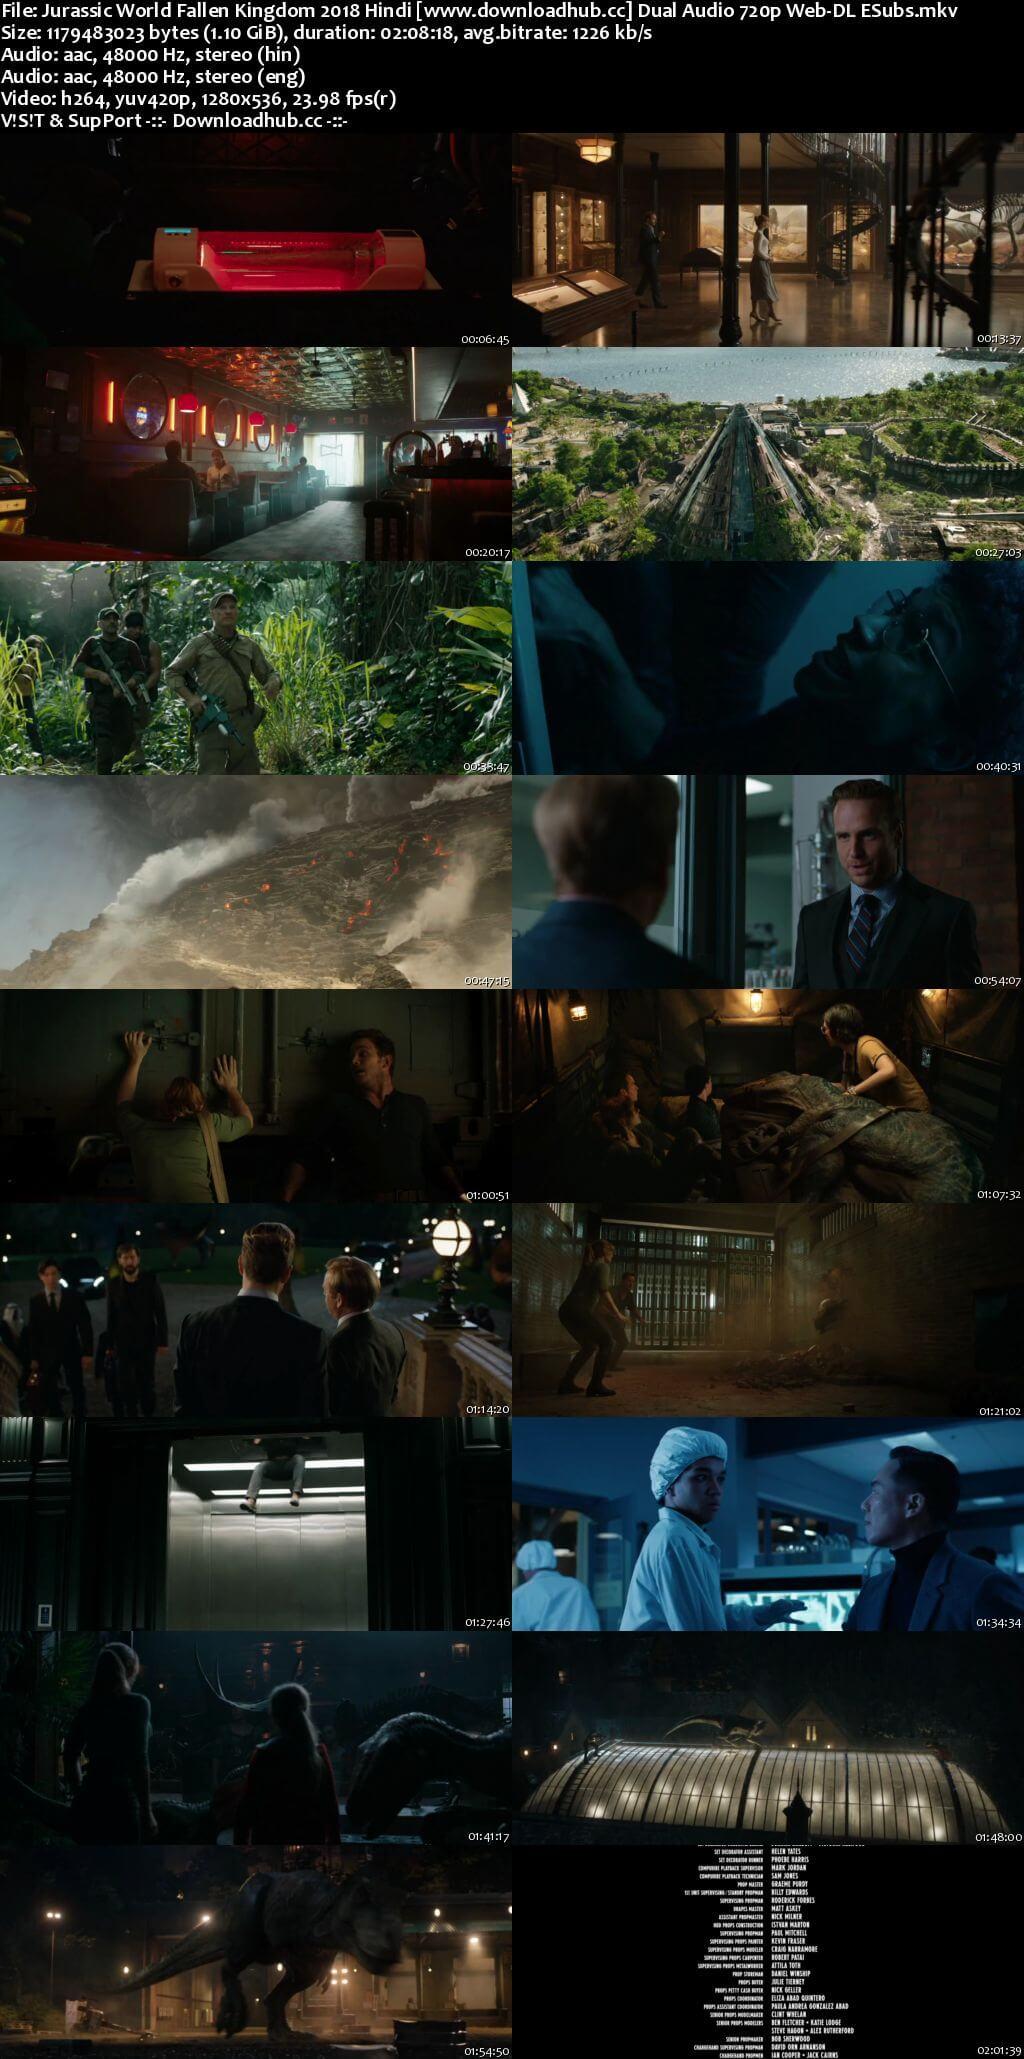 Jurassic World Fallen Kingdom 2018 Hindi Dual Audio 720p Web-DL ESubs